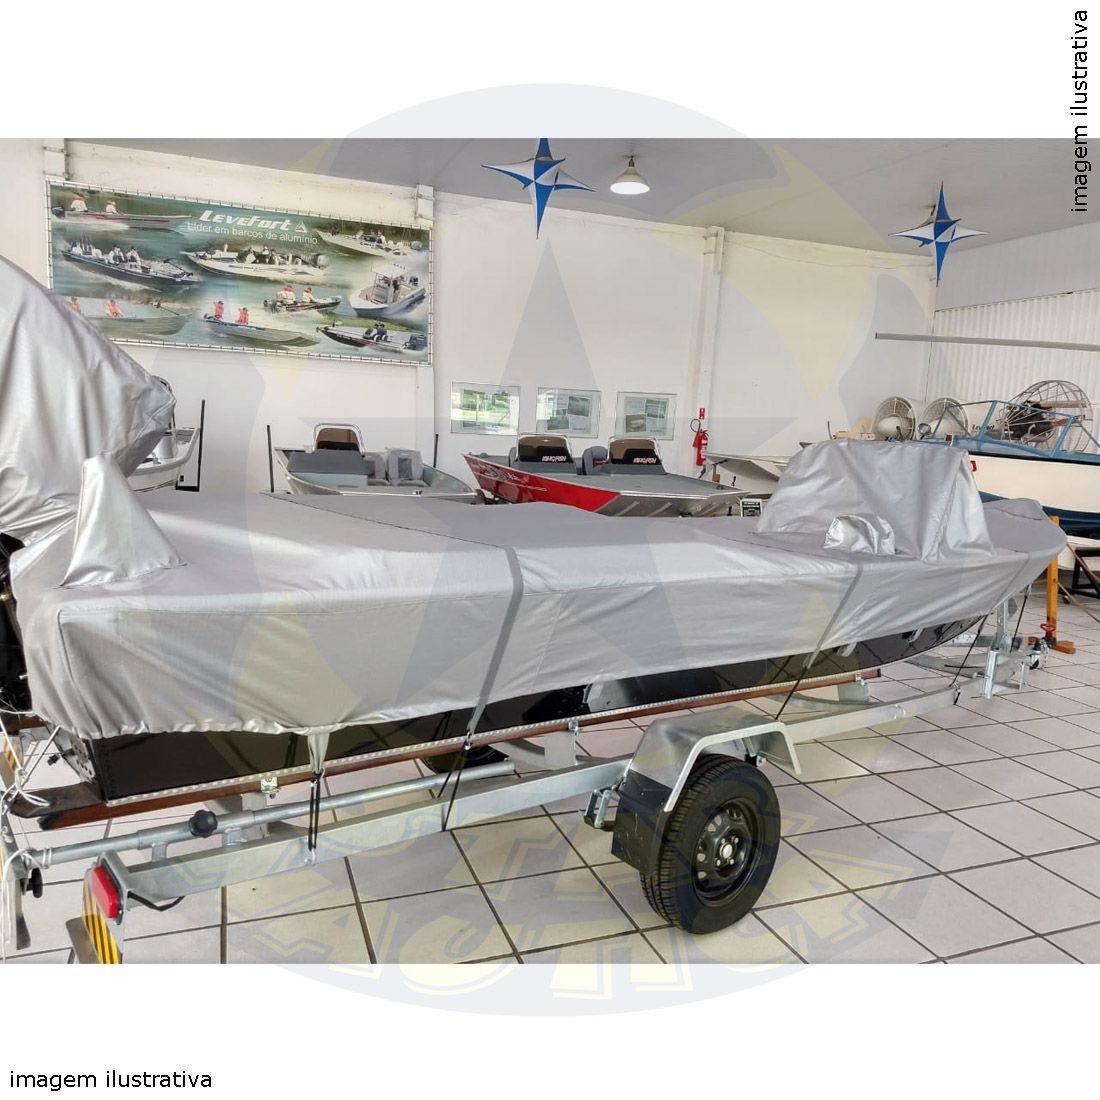 Capa Lona de Cobertura Lancha Big Fish 5014 Sport Lona Metalizada